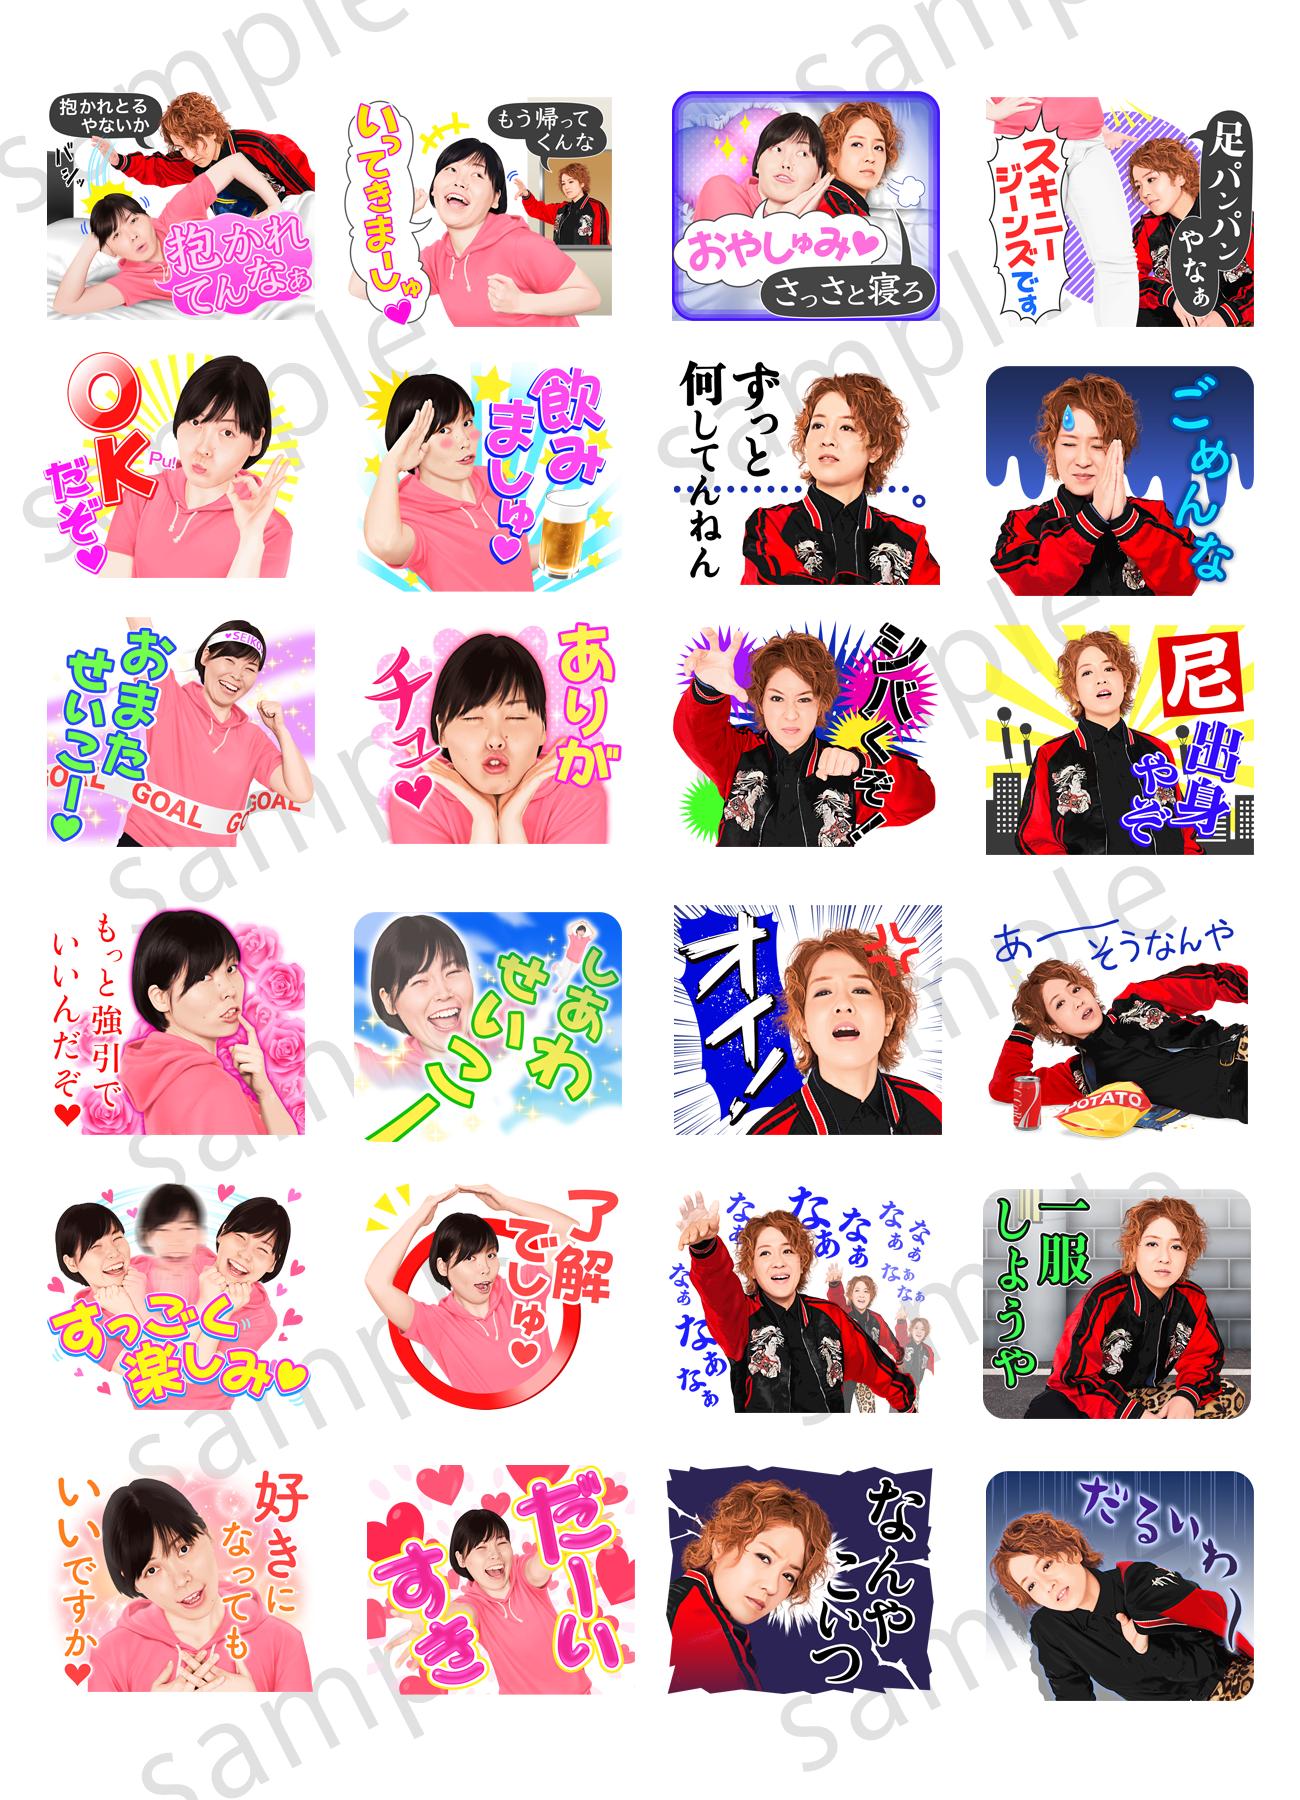 http://news.yoshimoto.co.jp/20170706114342-bfab1f1851047dadfe355eb28e907129c48ef096.png